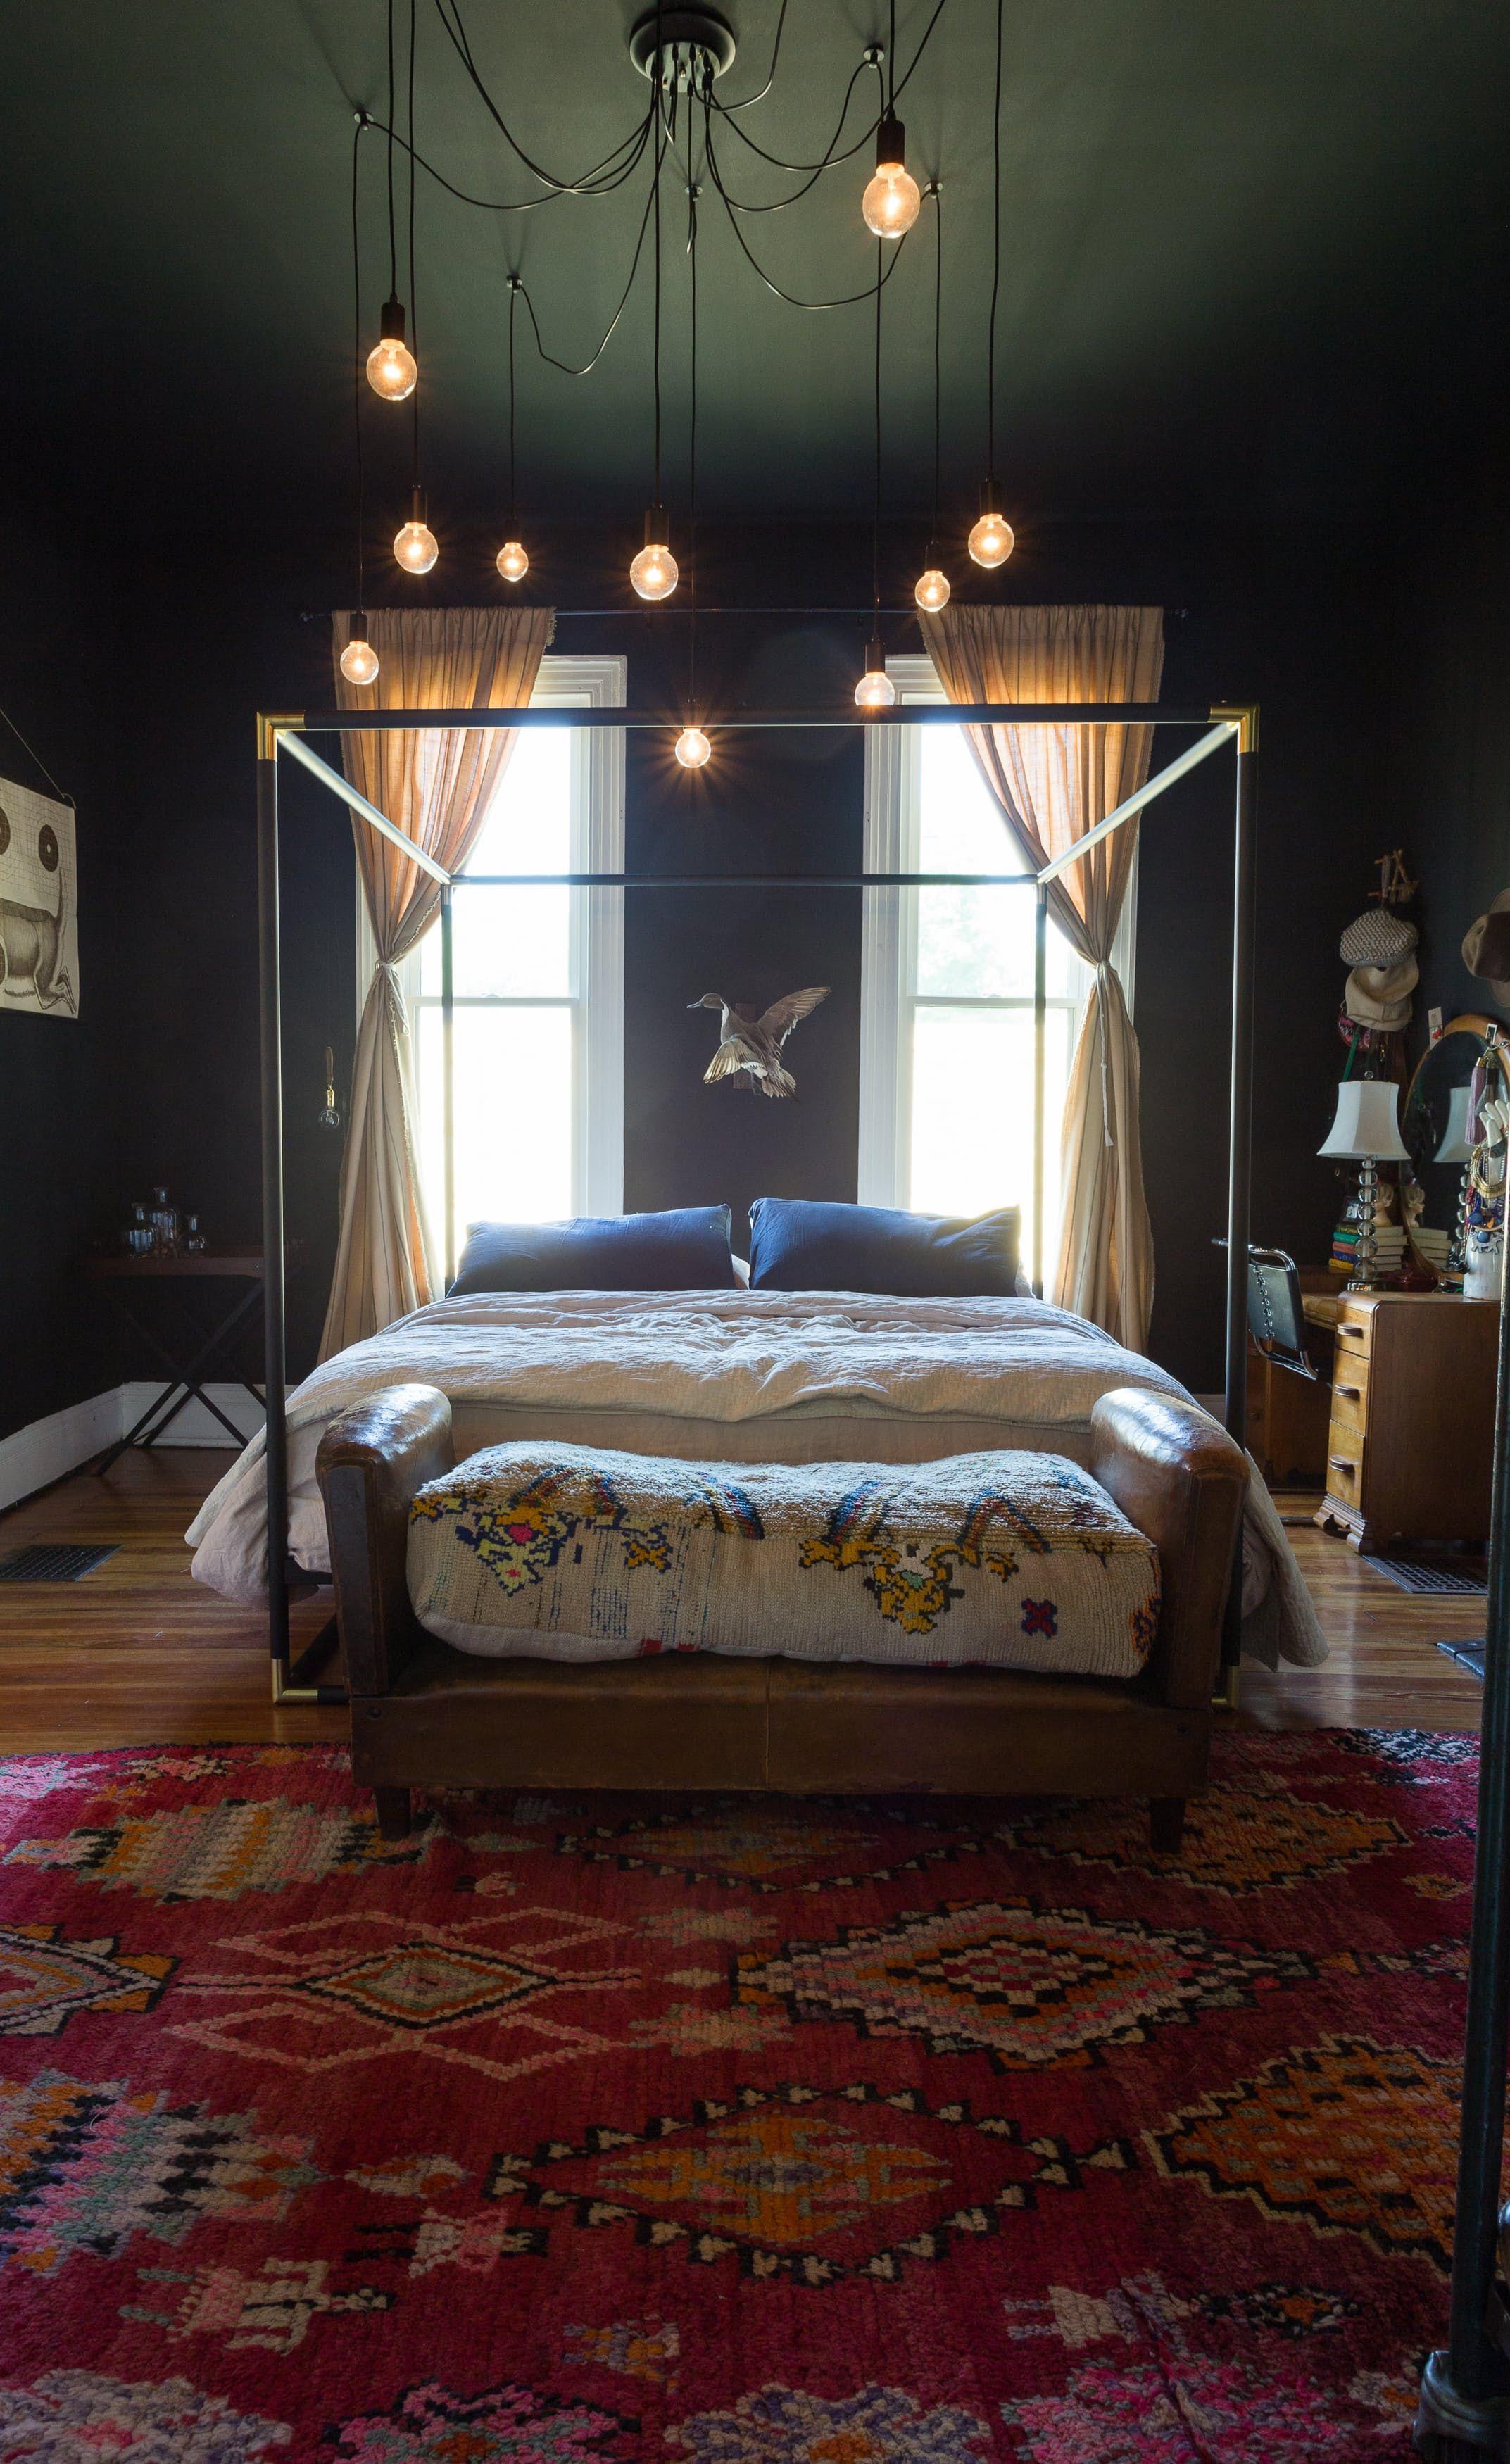 Diy light inspiration from an antique dealers nostalgic bohemian nashville bungalow house